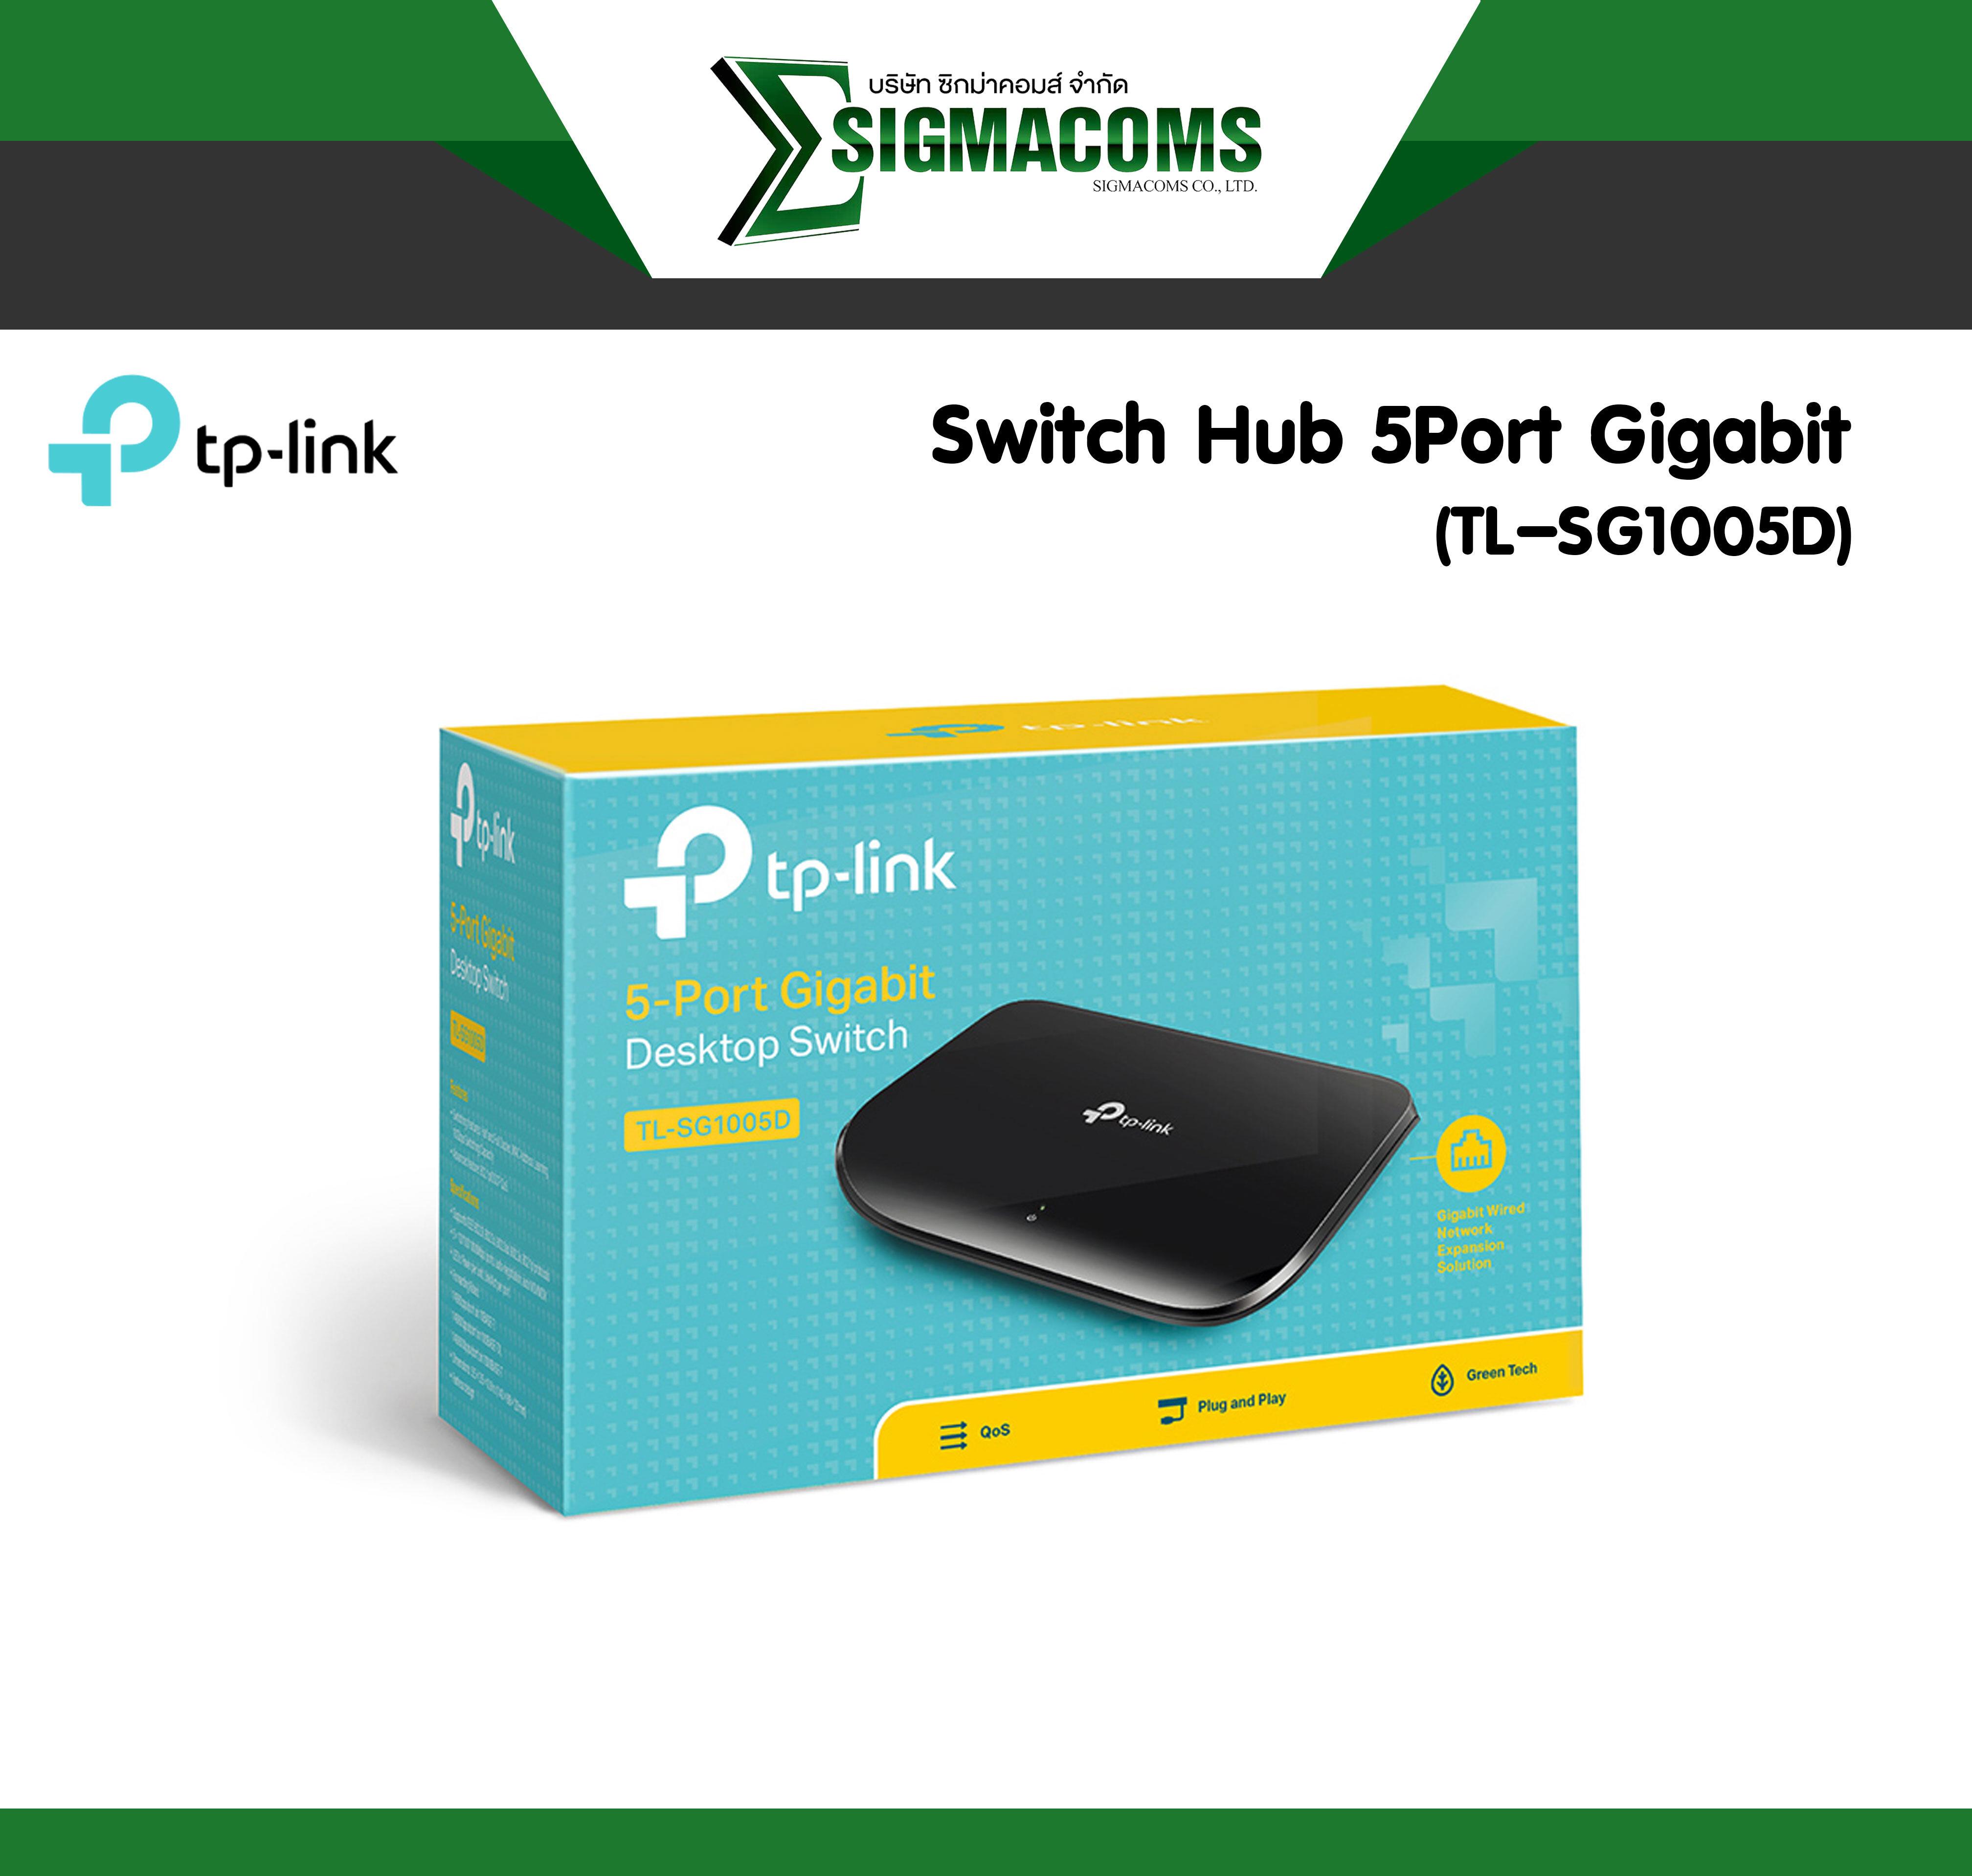 Network Switch Hub Tp-Link Tl-Sg1005d 5port Gigabit ของใหม่ !! ประกัน Lifetime.